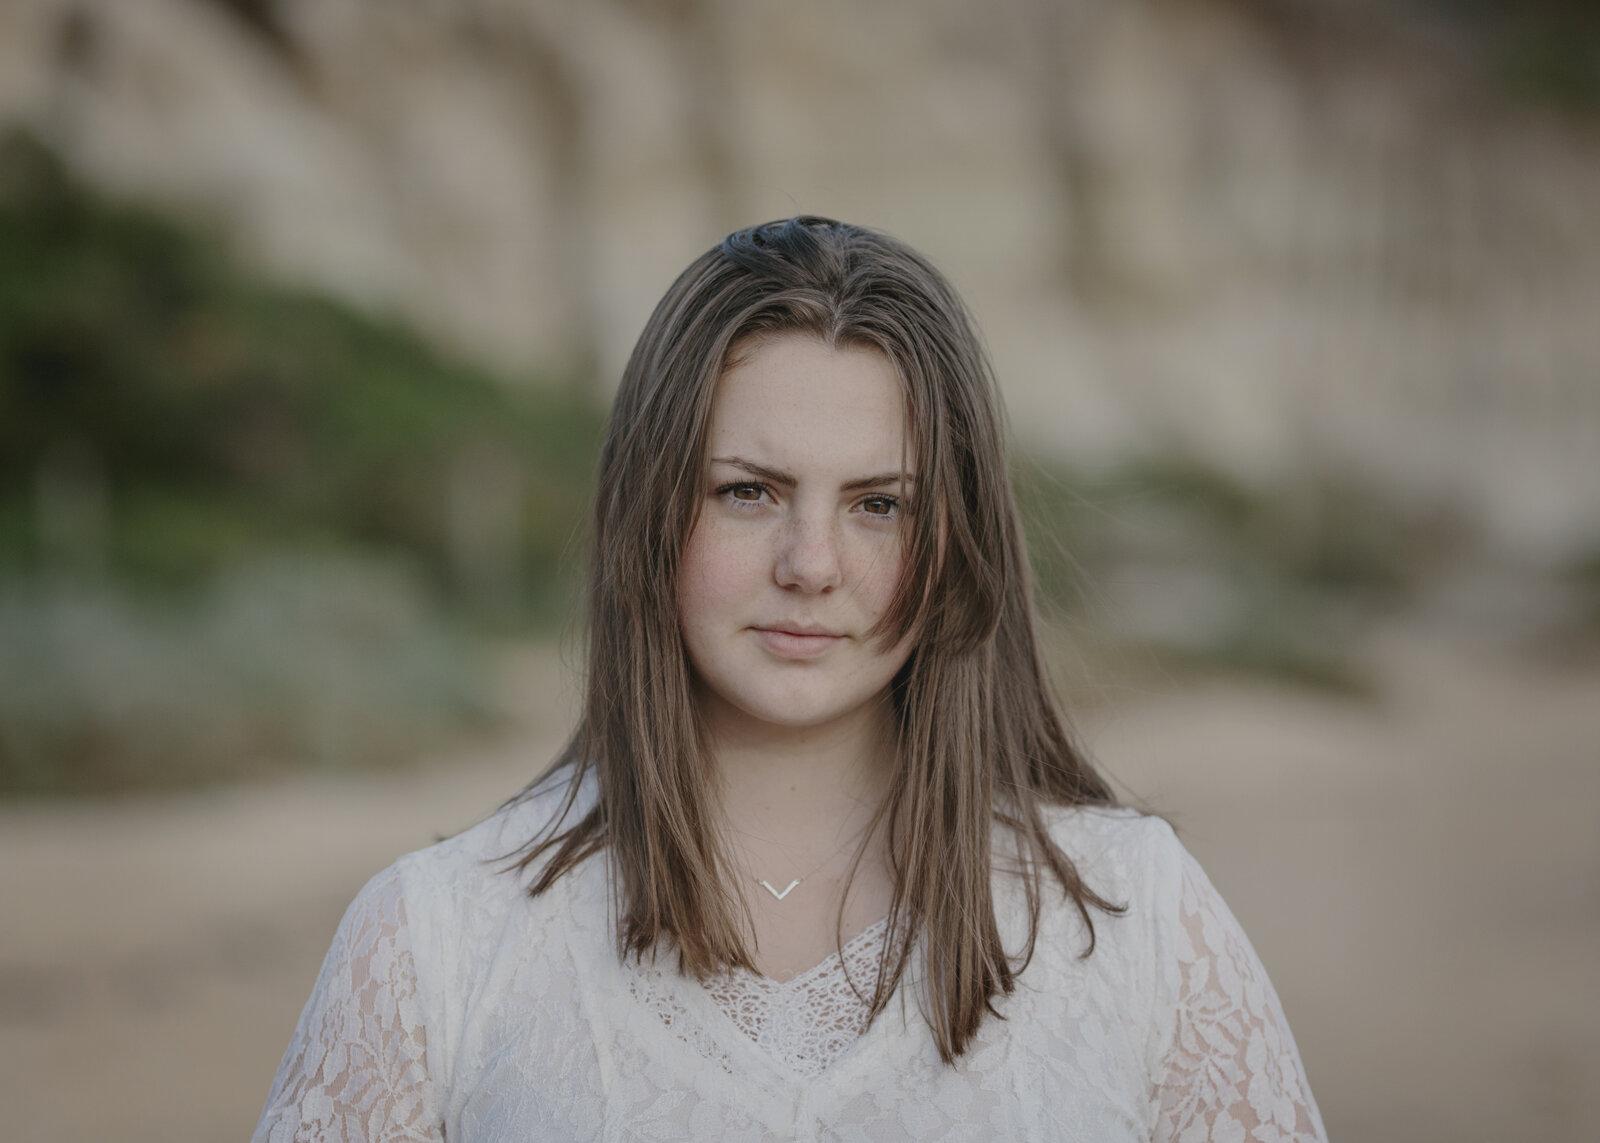 Teen Photographer Melbourne